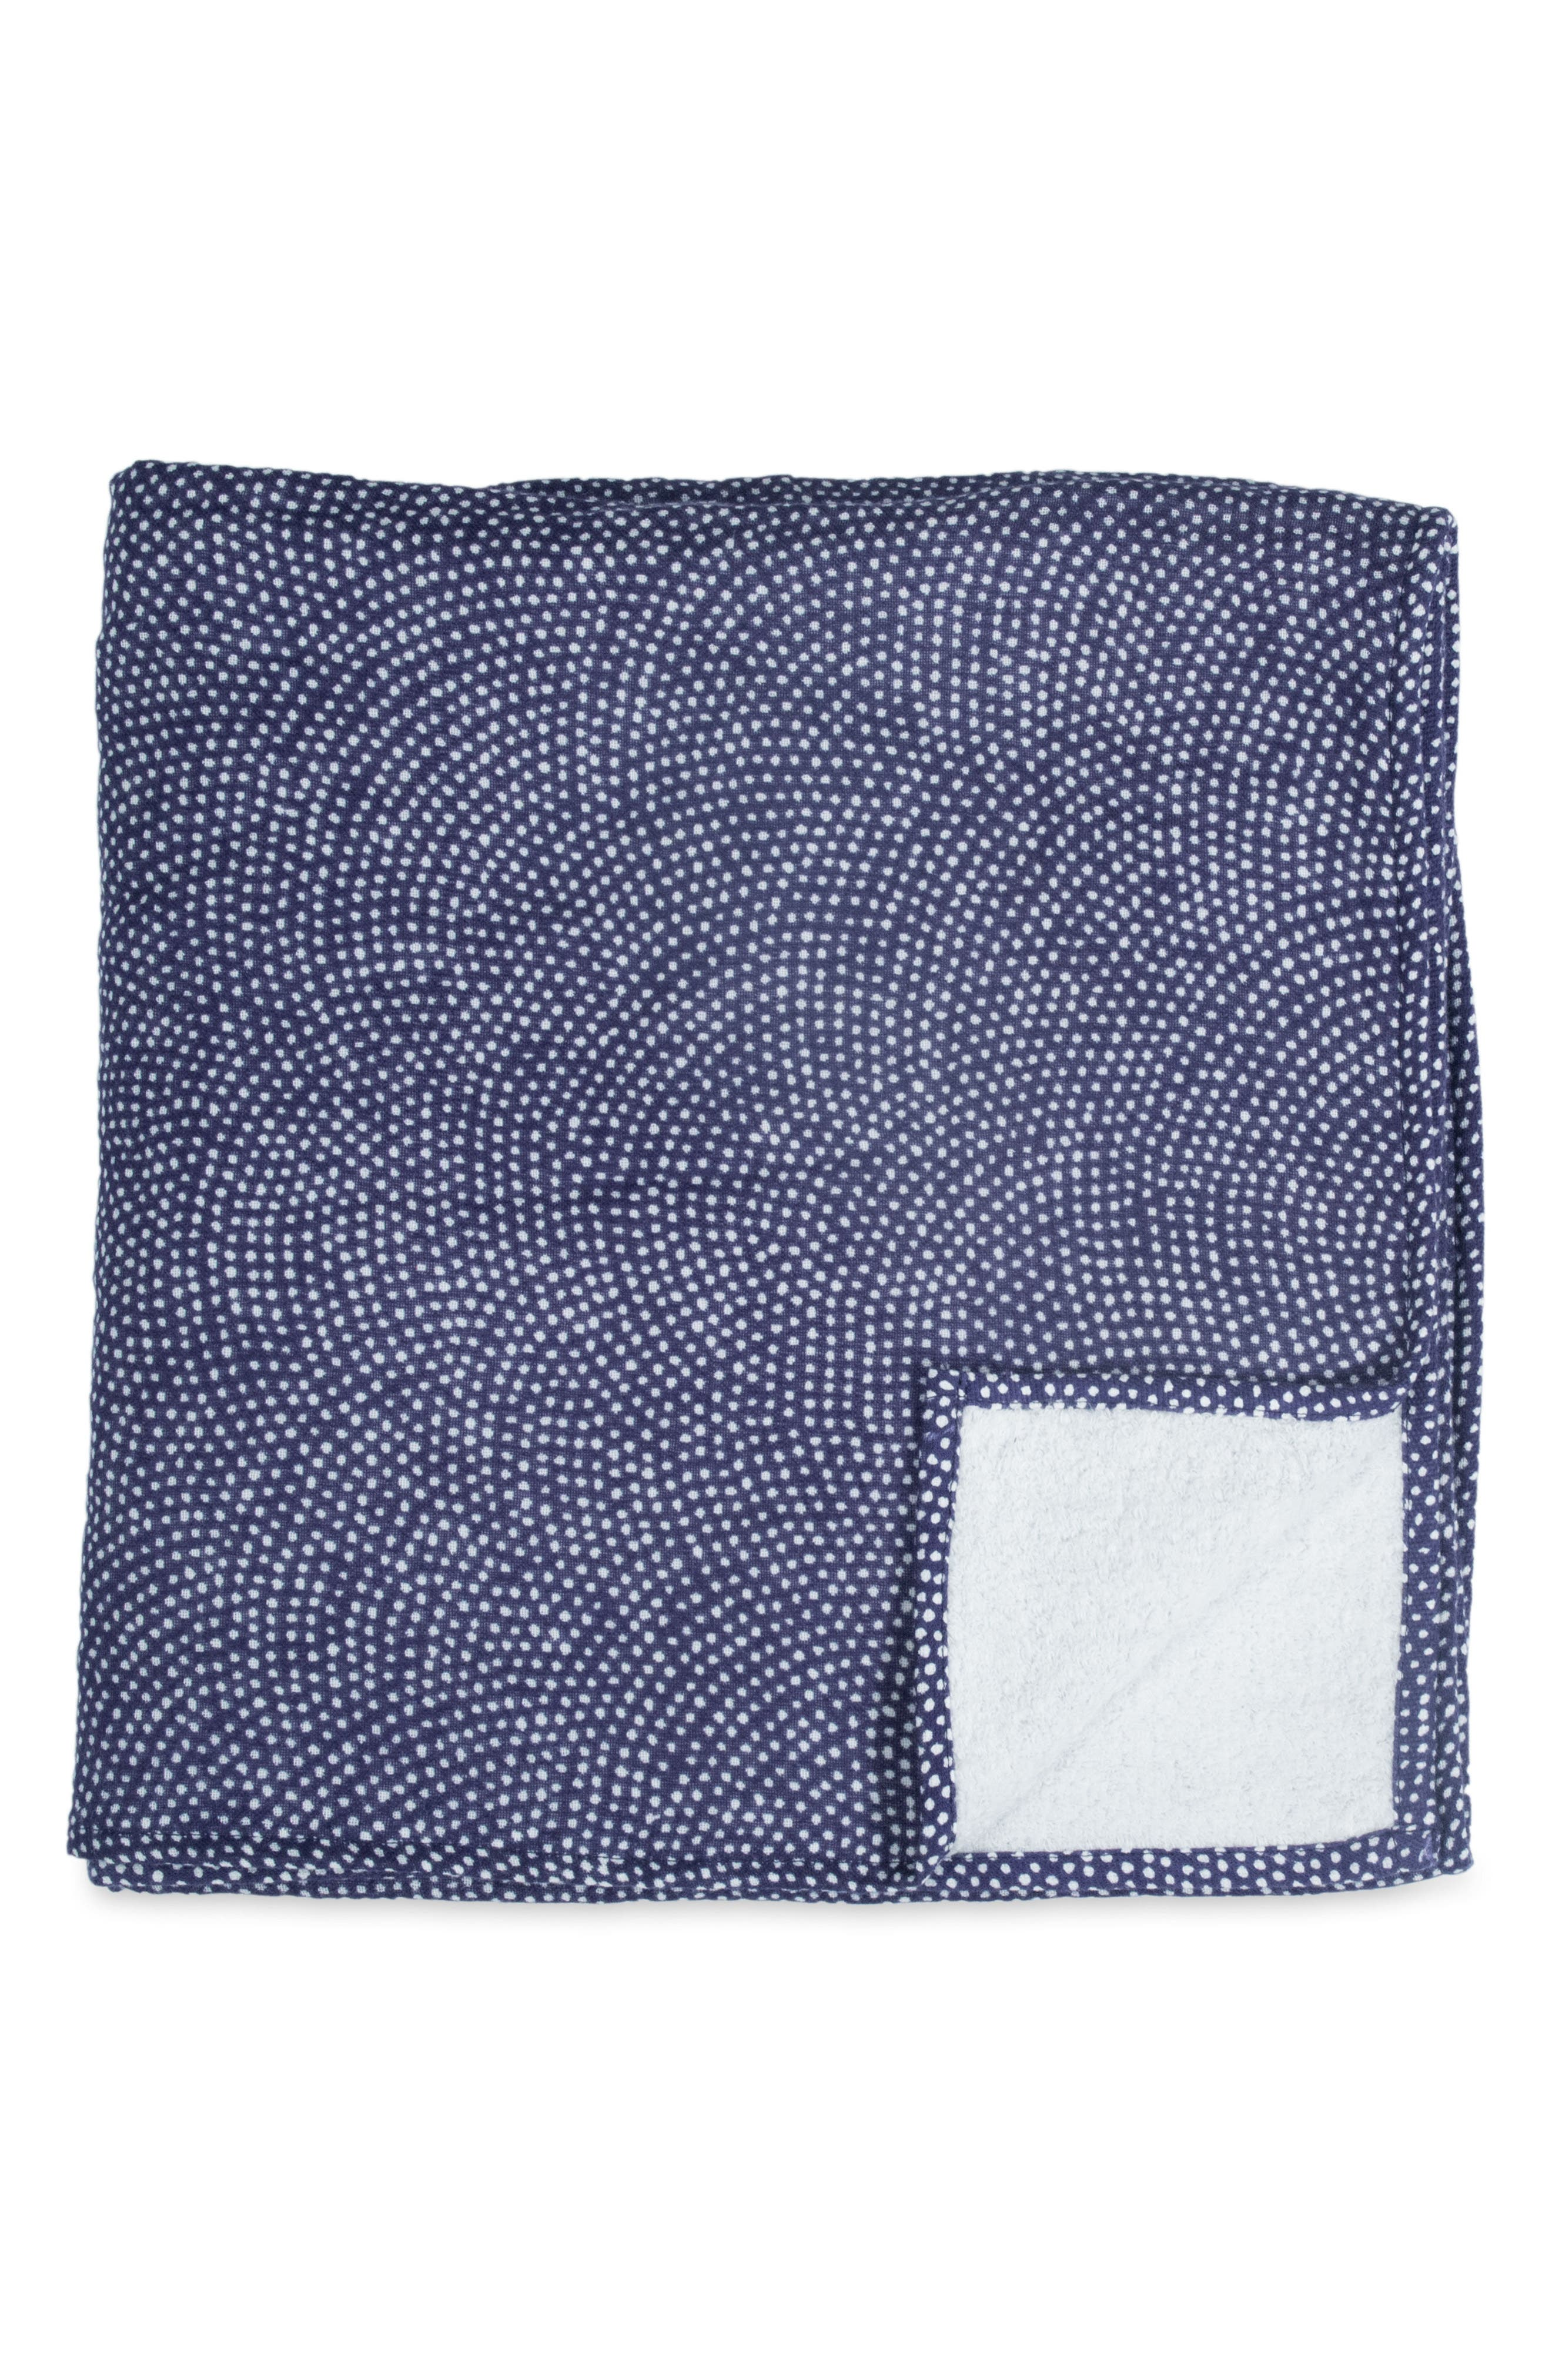 Zero Twist Print Bath Towel,                         Main,                         color, Dark Blue